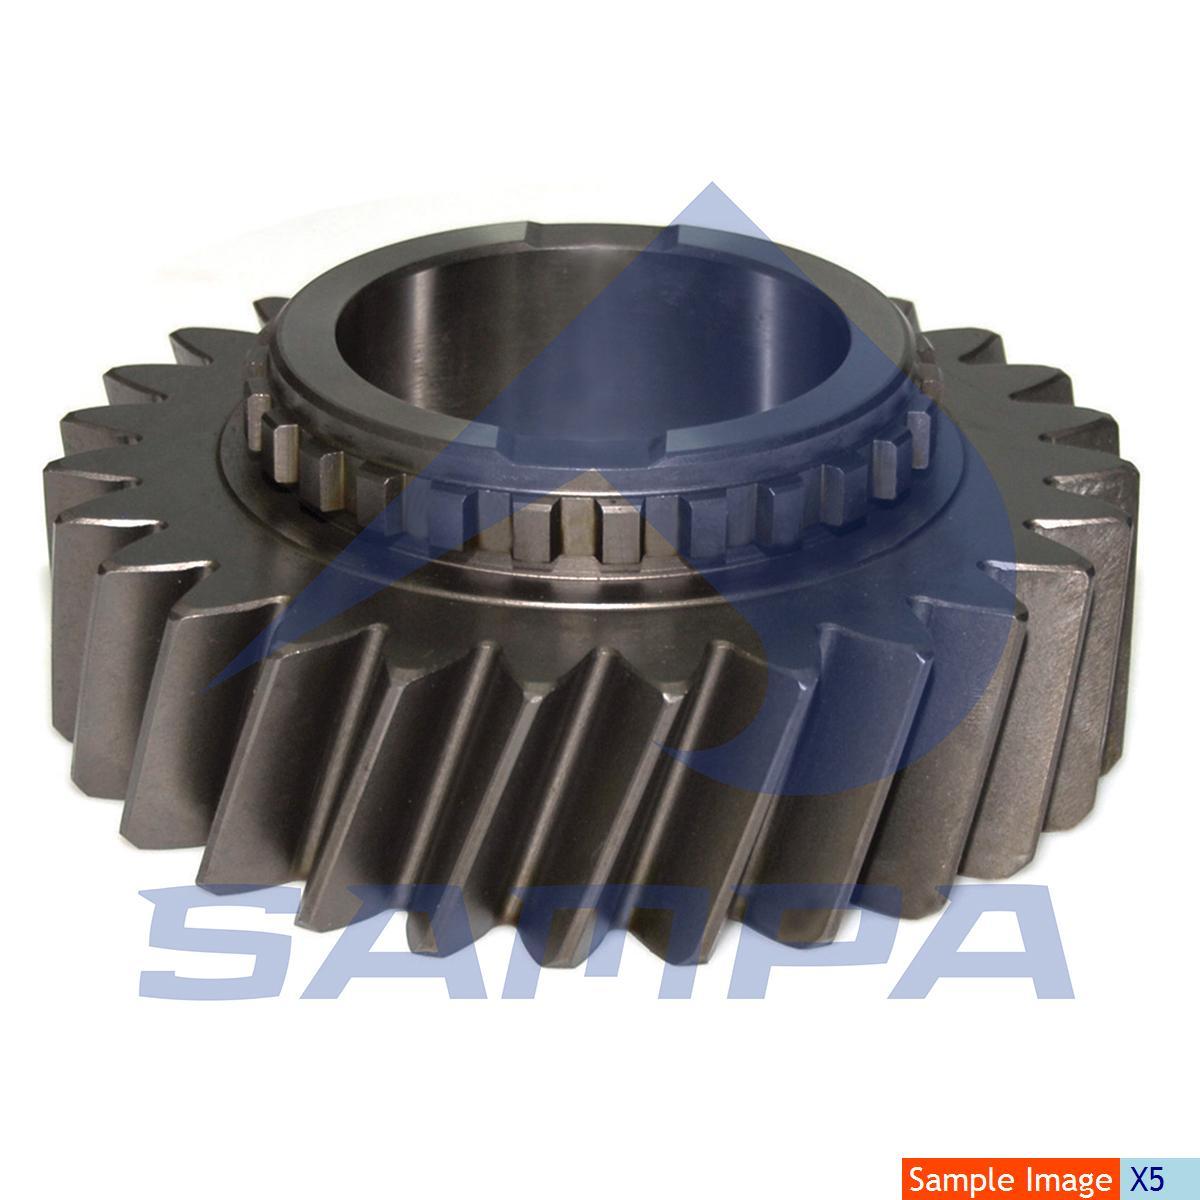 Gear, Main Shaft, Iveco, Gear Box